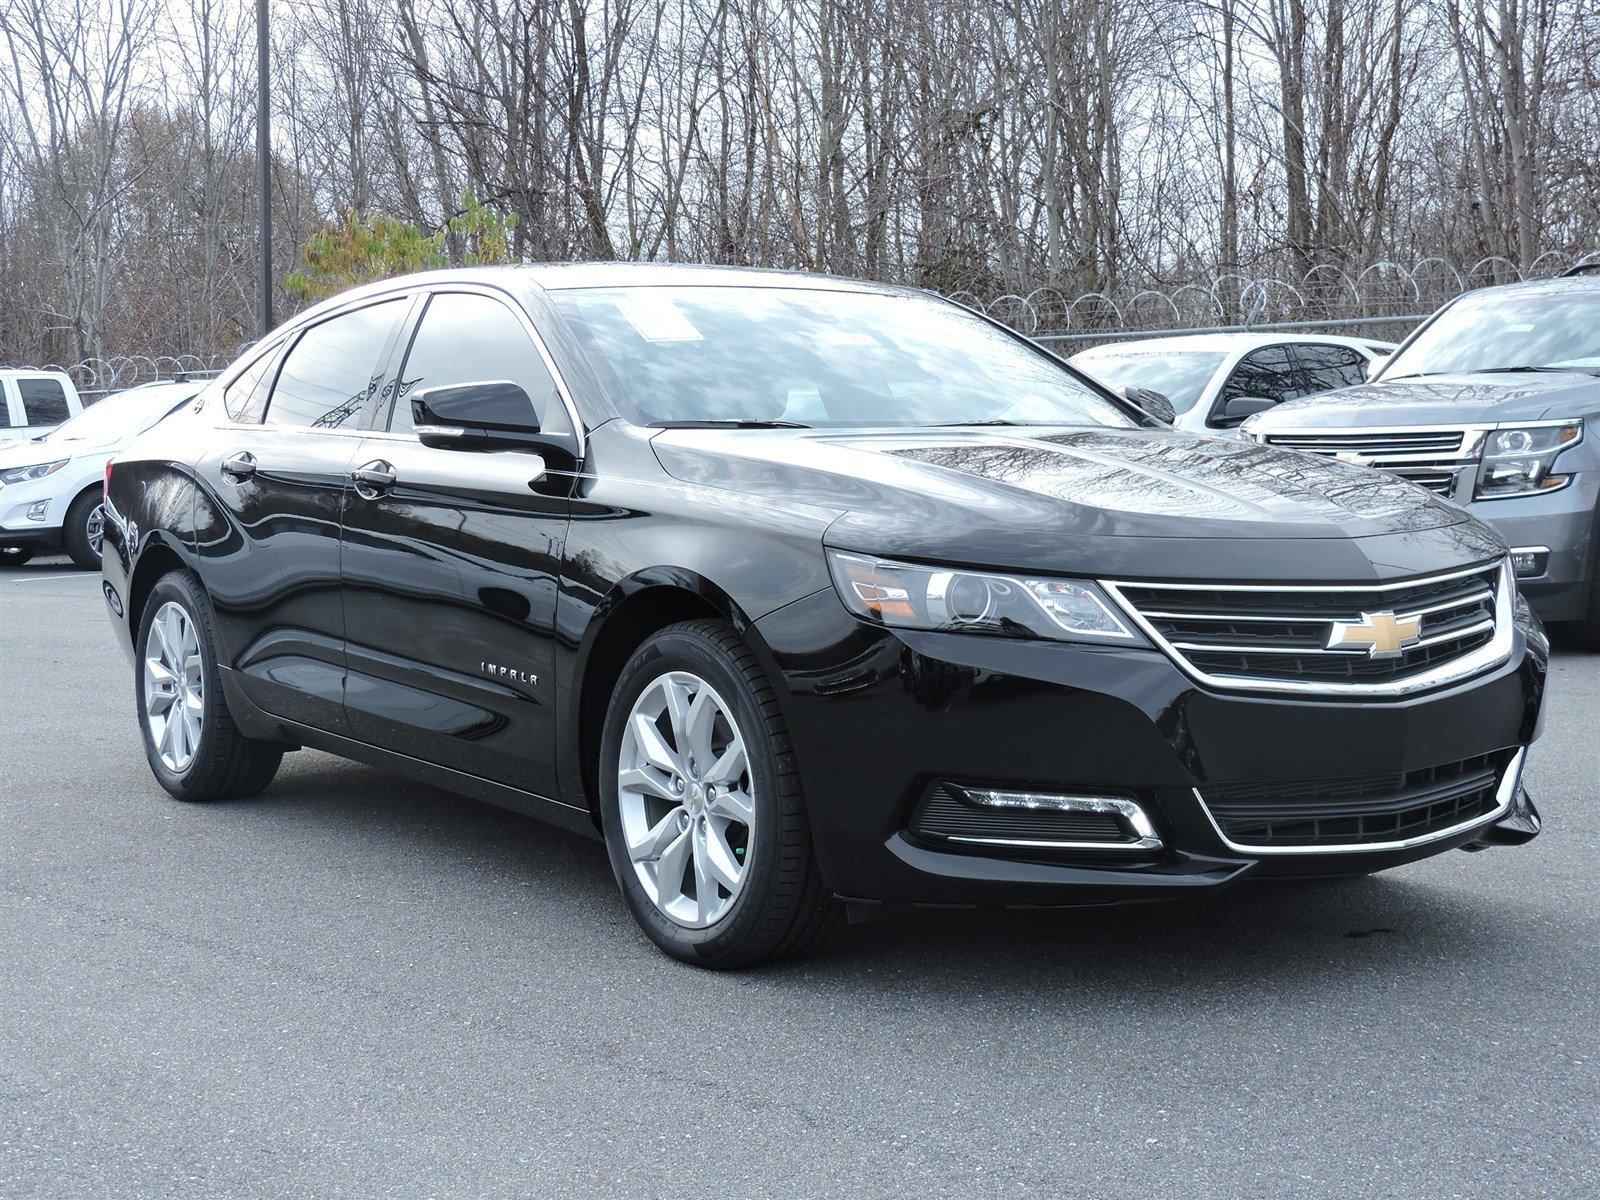 New 2019 Chevrolet Impala For Sale Winston Salem NC